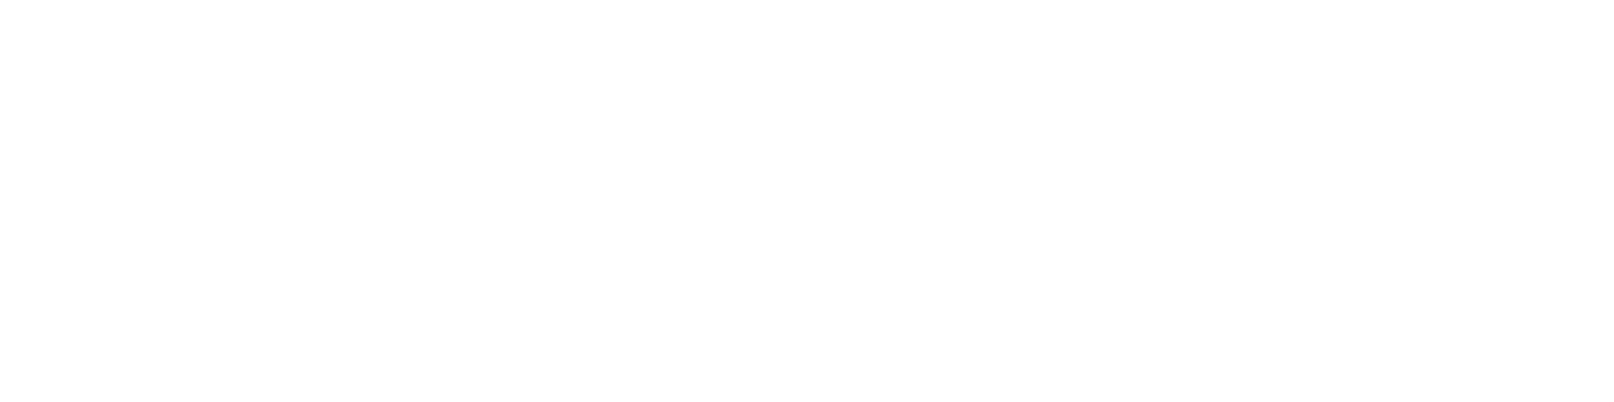 Raintree Corporate Finance